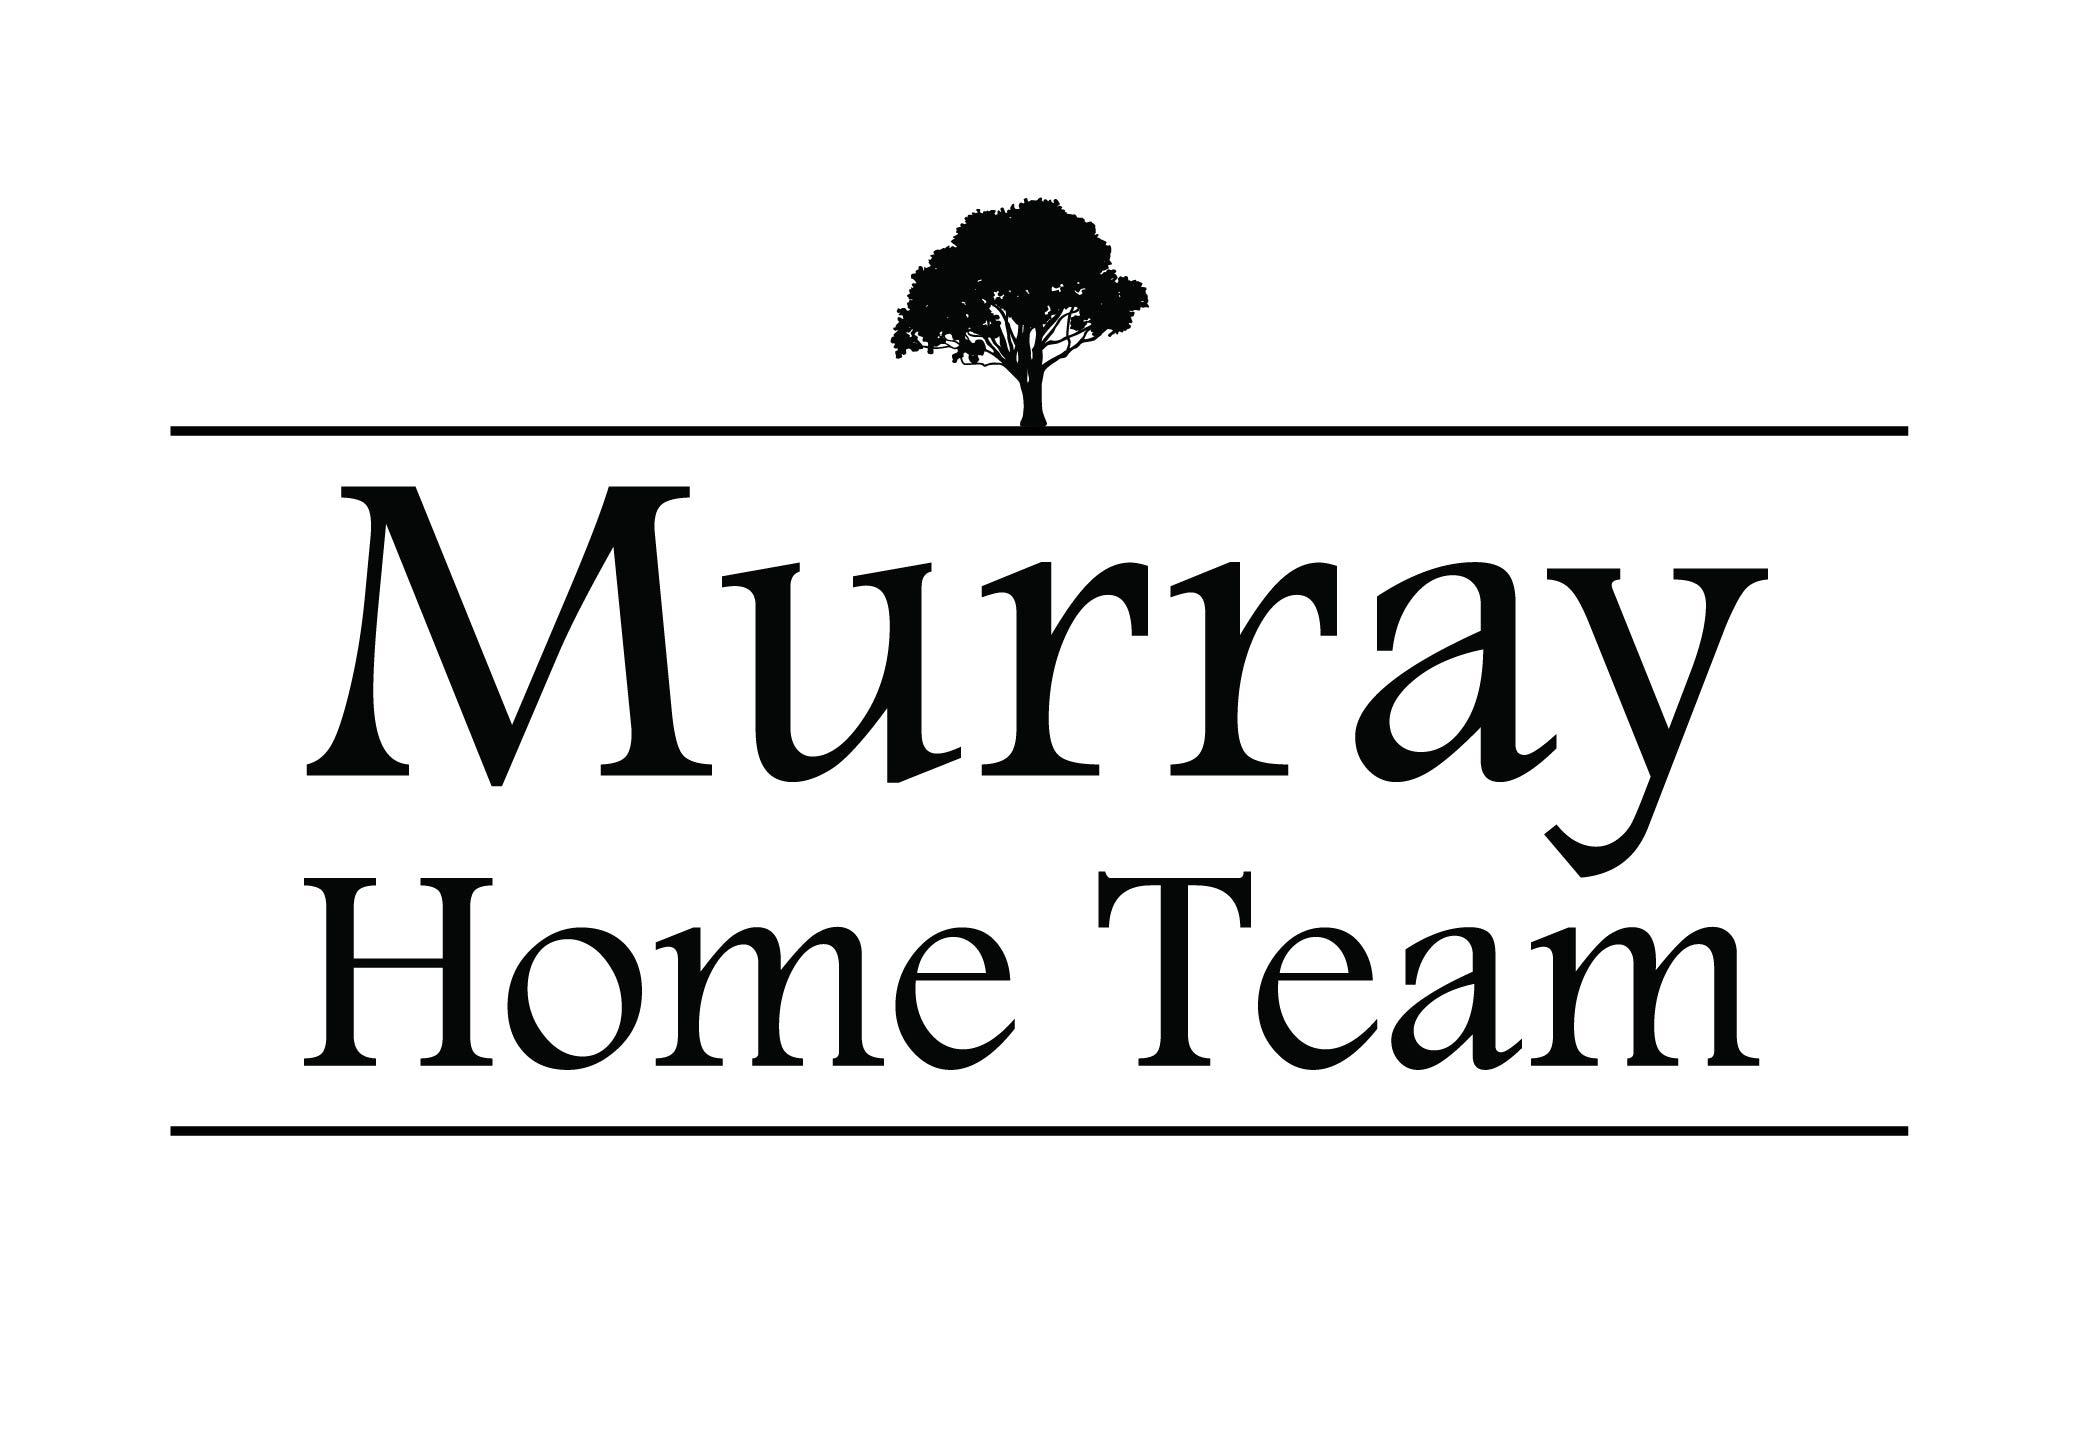 The Murray Home Team